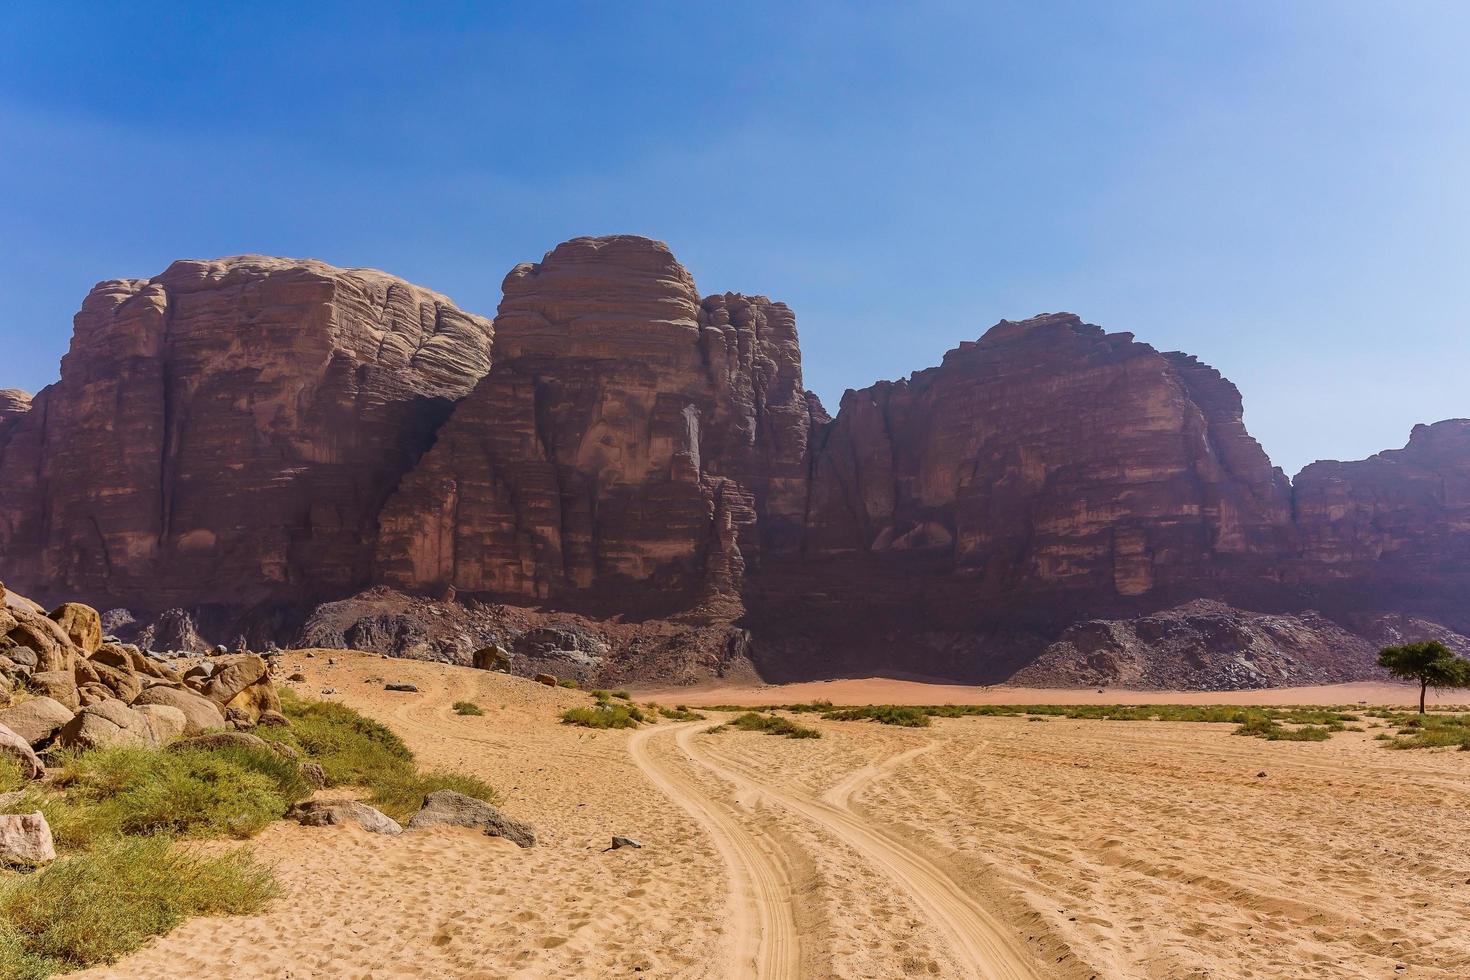 montagne rosse del deserto di wadi rum in giordania foto